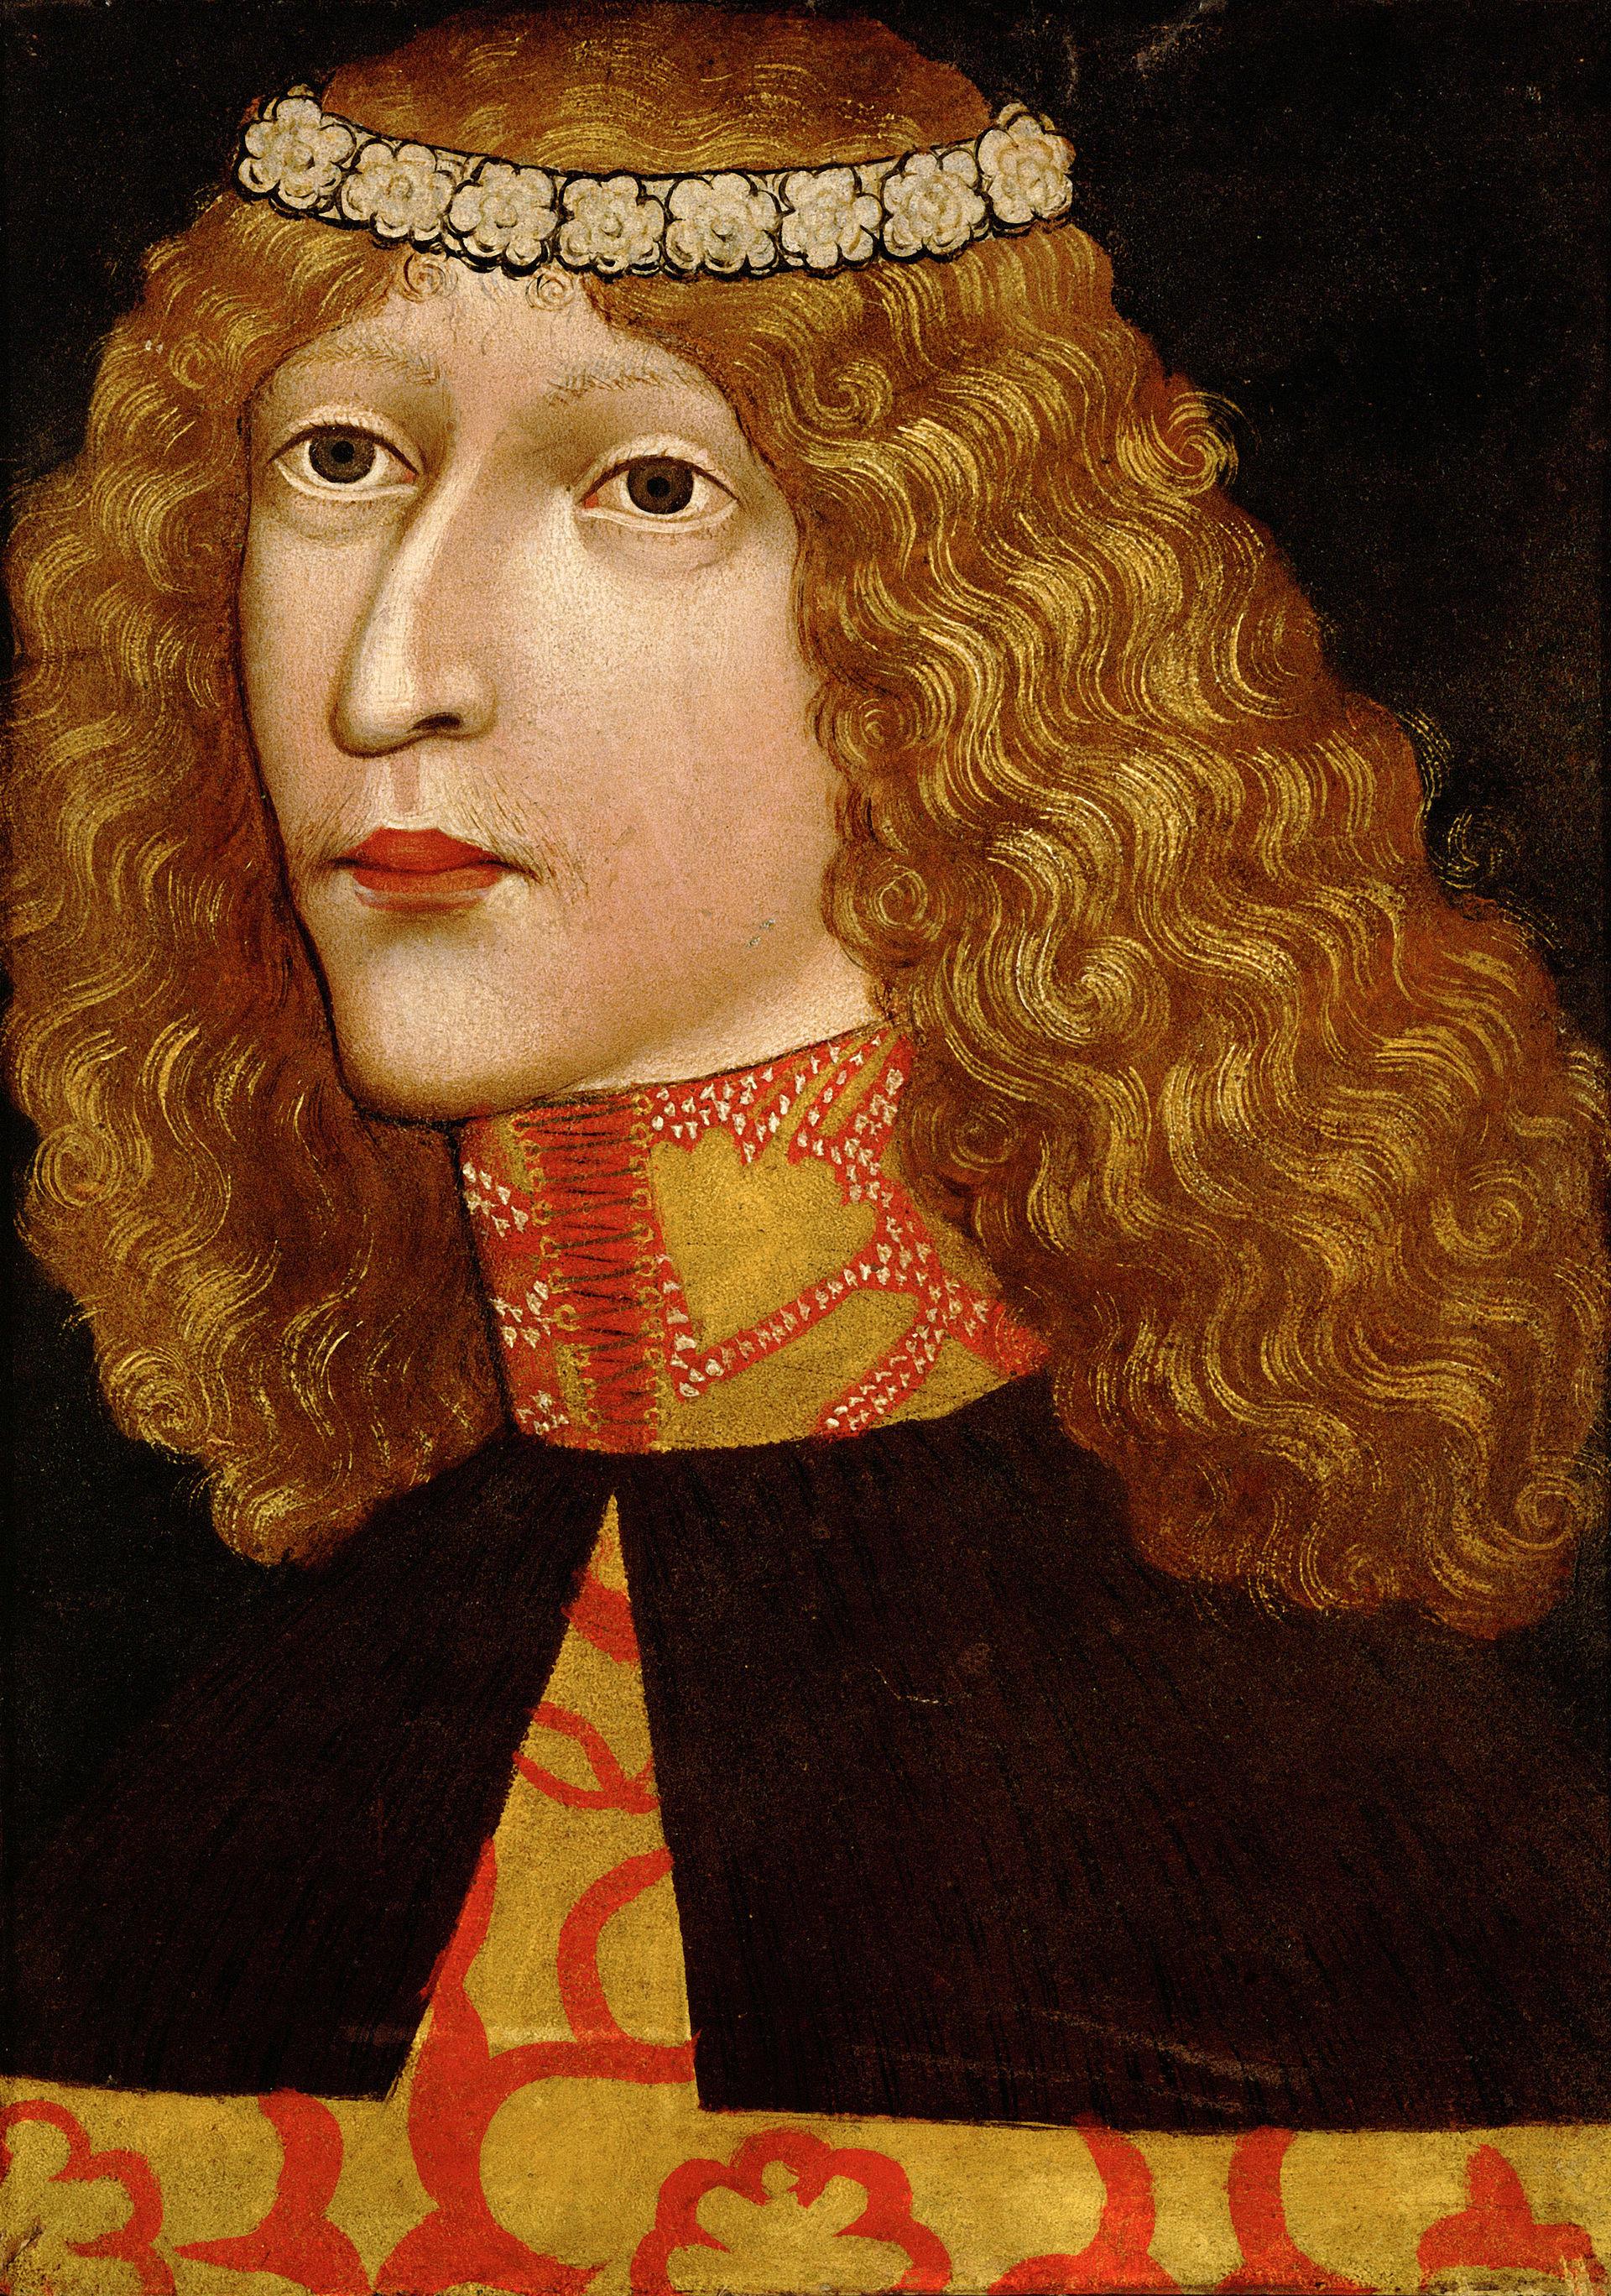 Ladislaus the Posthumous - Wikipedia